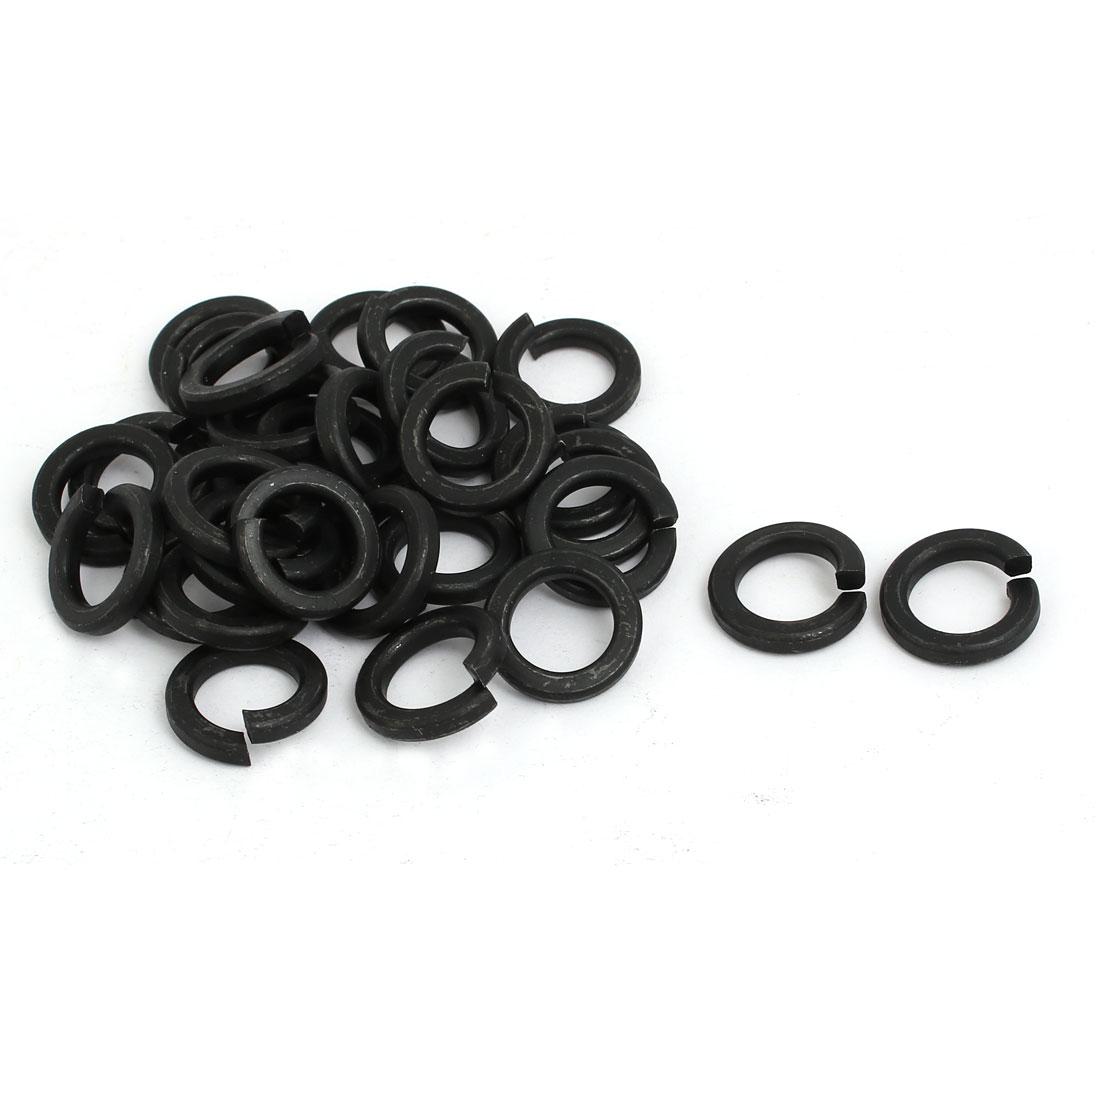 30pcs 12mm Inner Dia Grade 8 Carbon Steel Split Lock Spring Washer Gasket Black